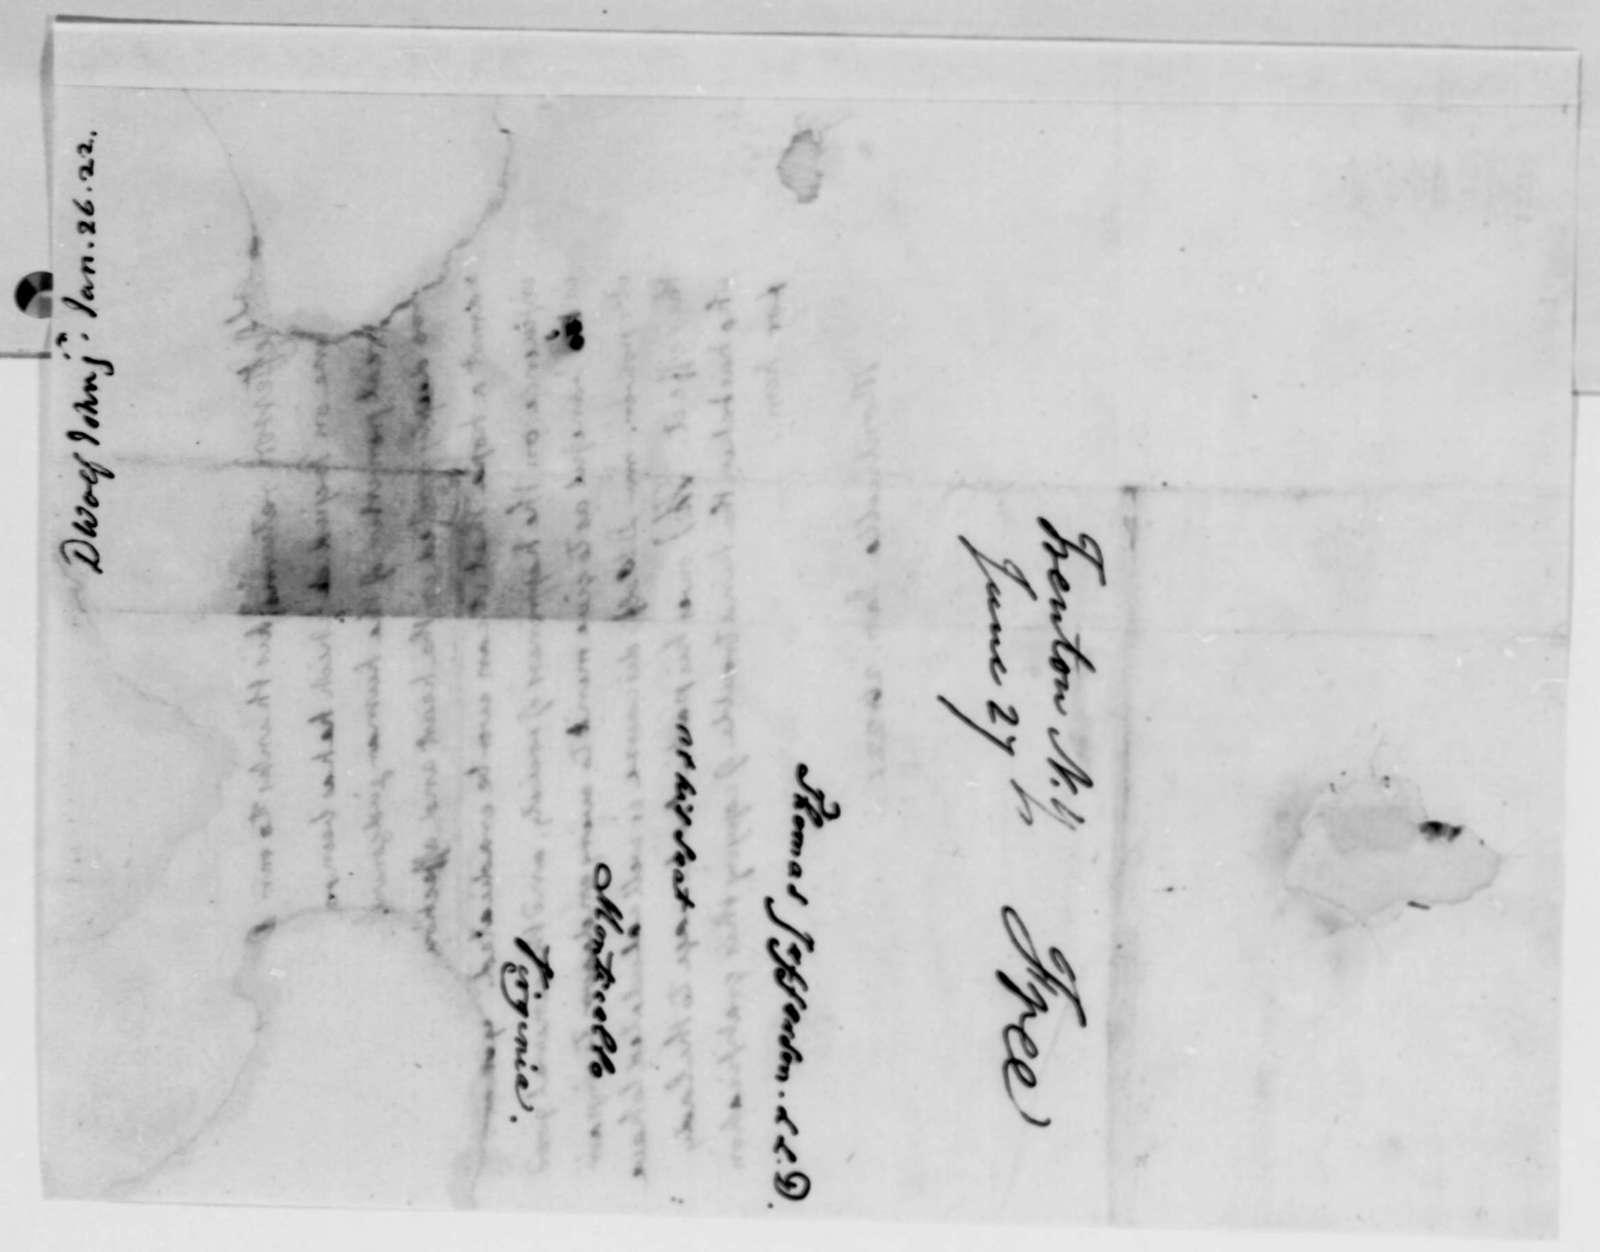 Thomas Jefferson to John D. Wolfe, Jr., January 26, 1822